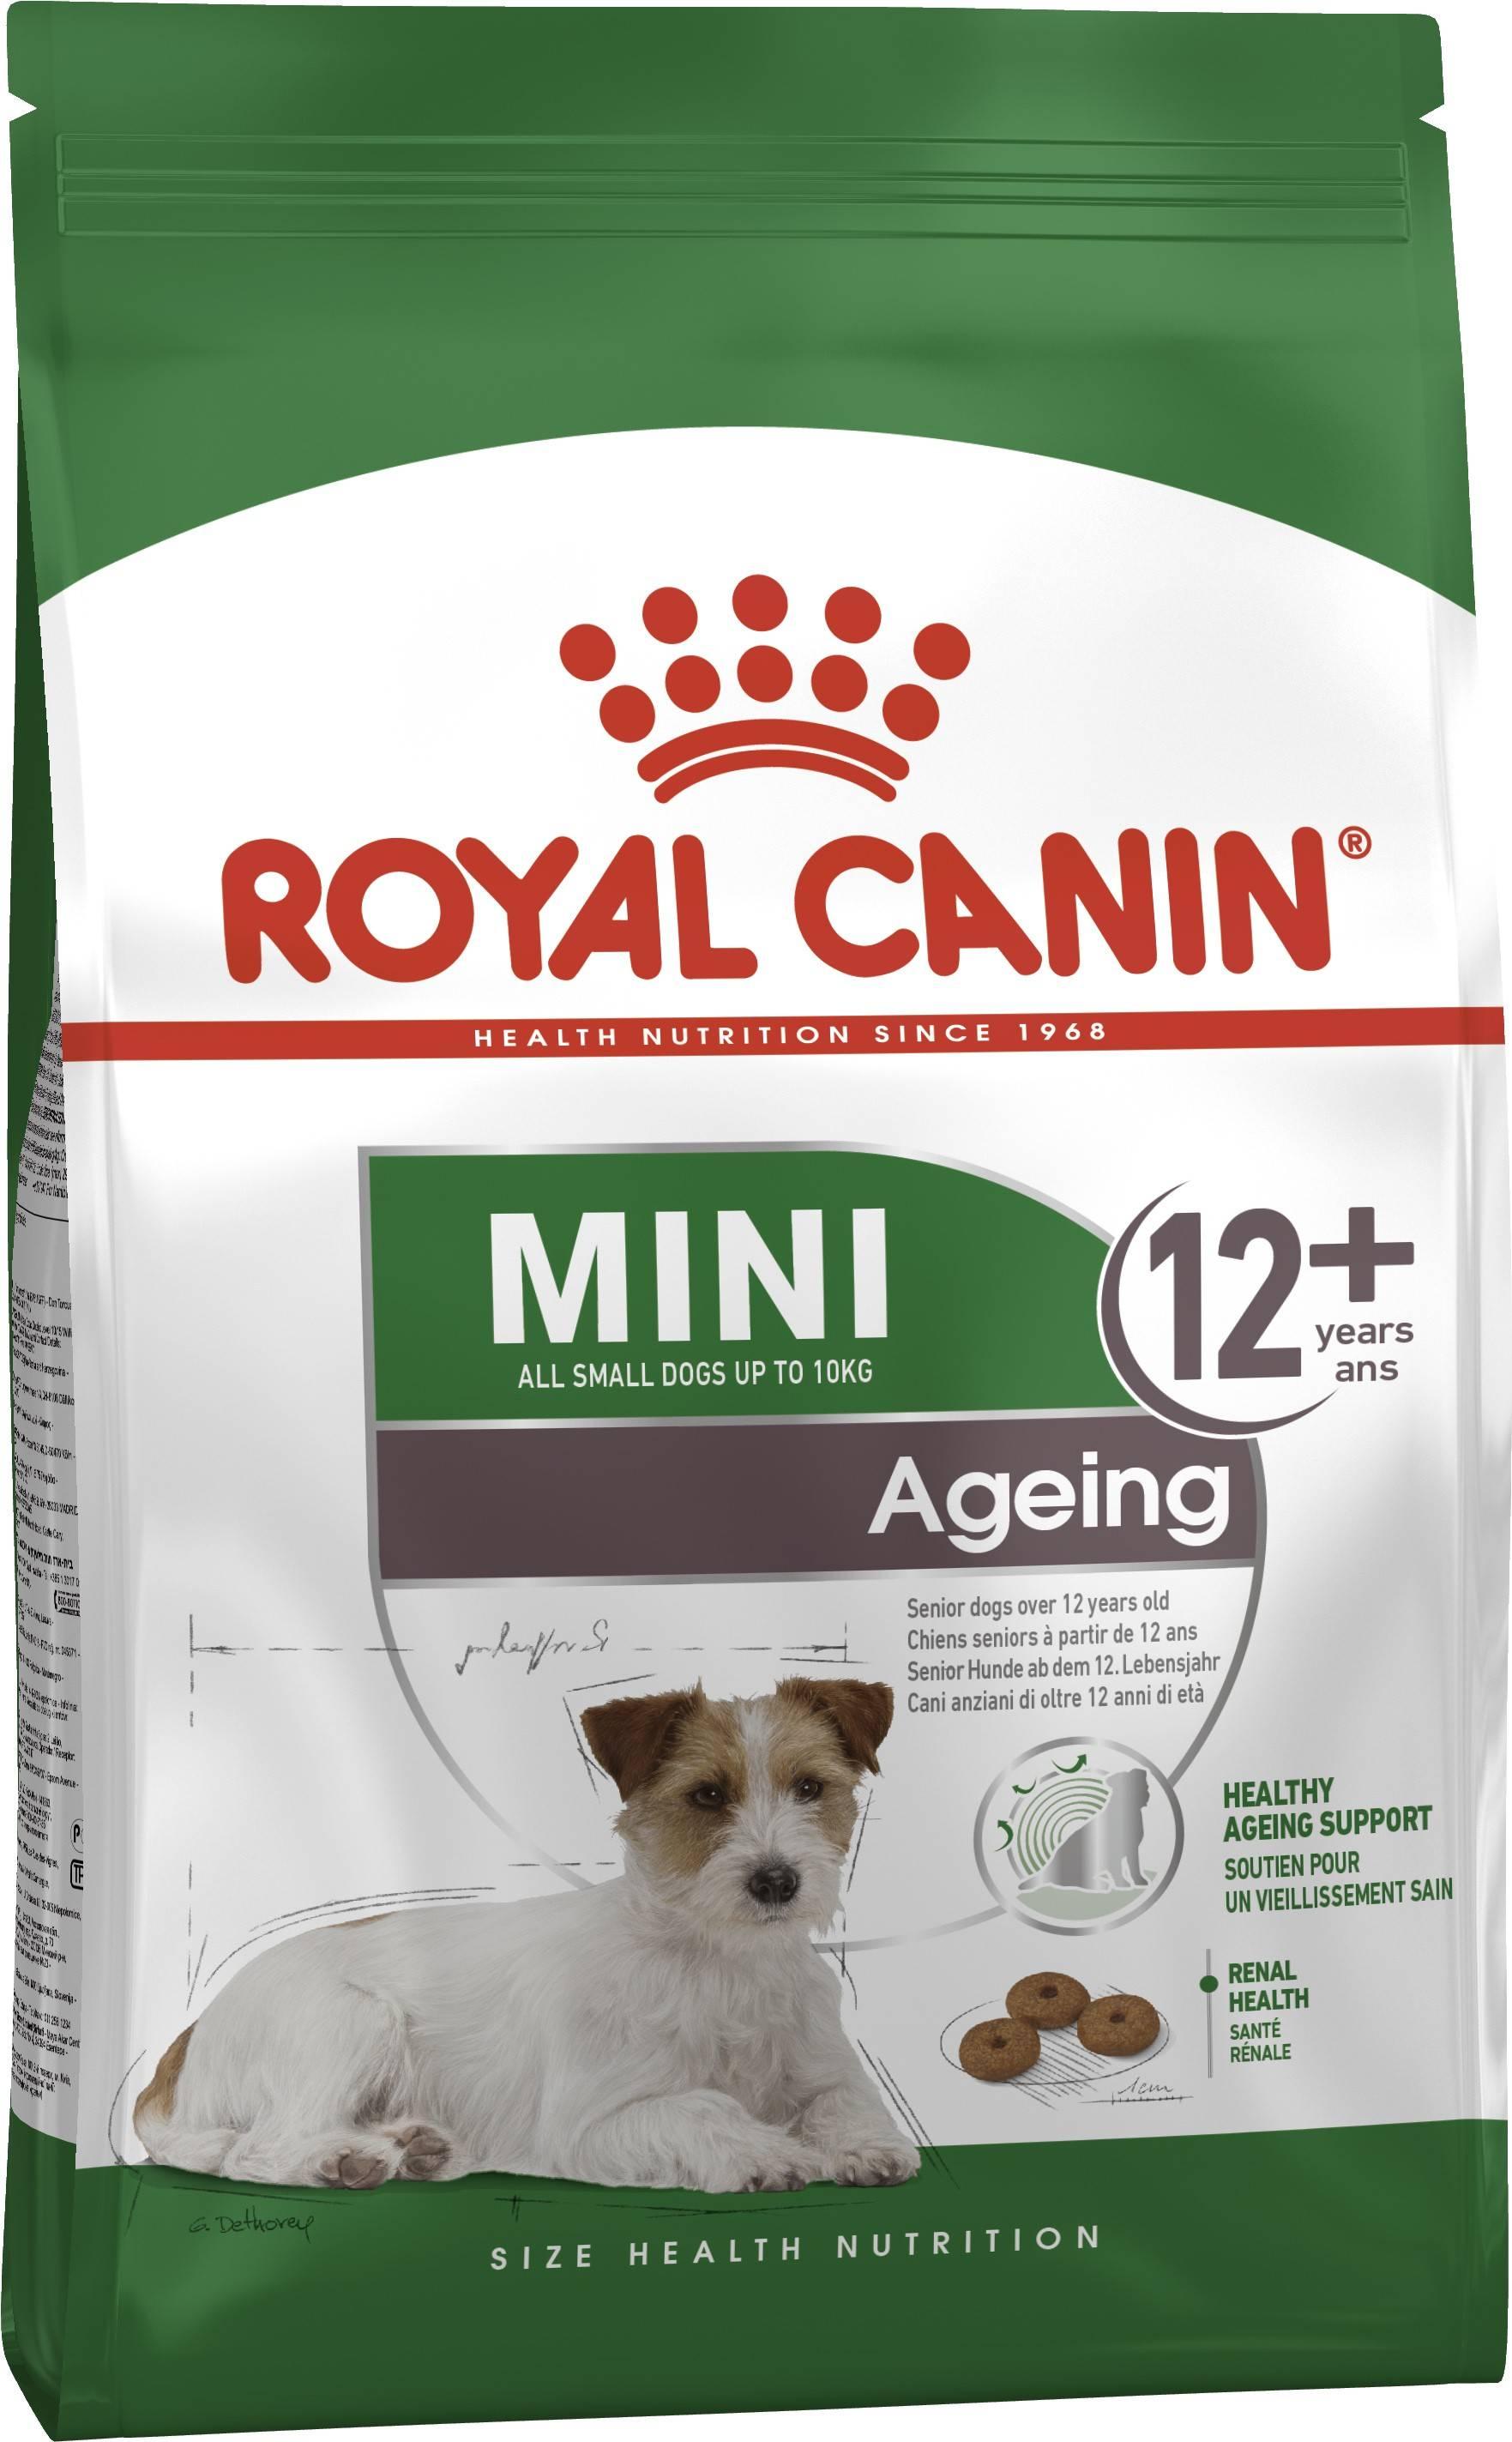 ROYAL CANIN MINI AGEING 12+ – сухой корм для собак мелких пород старше 12 лет